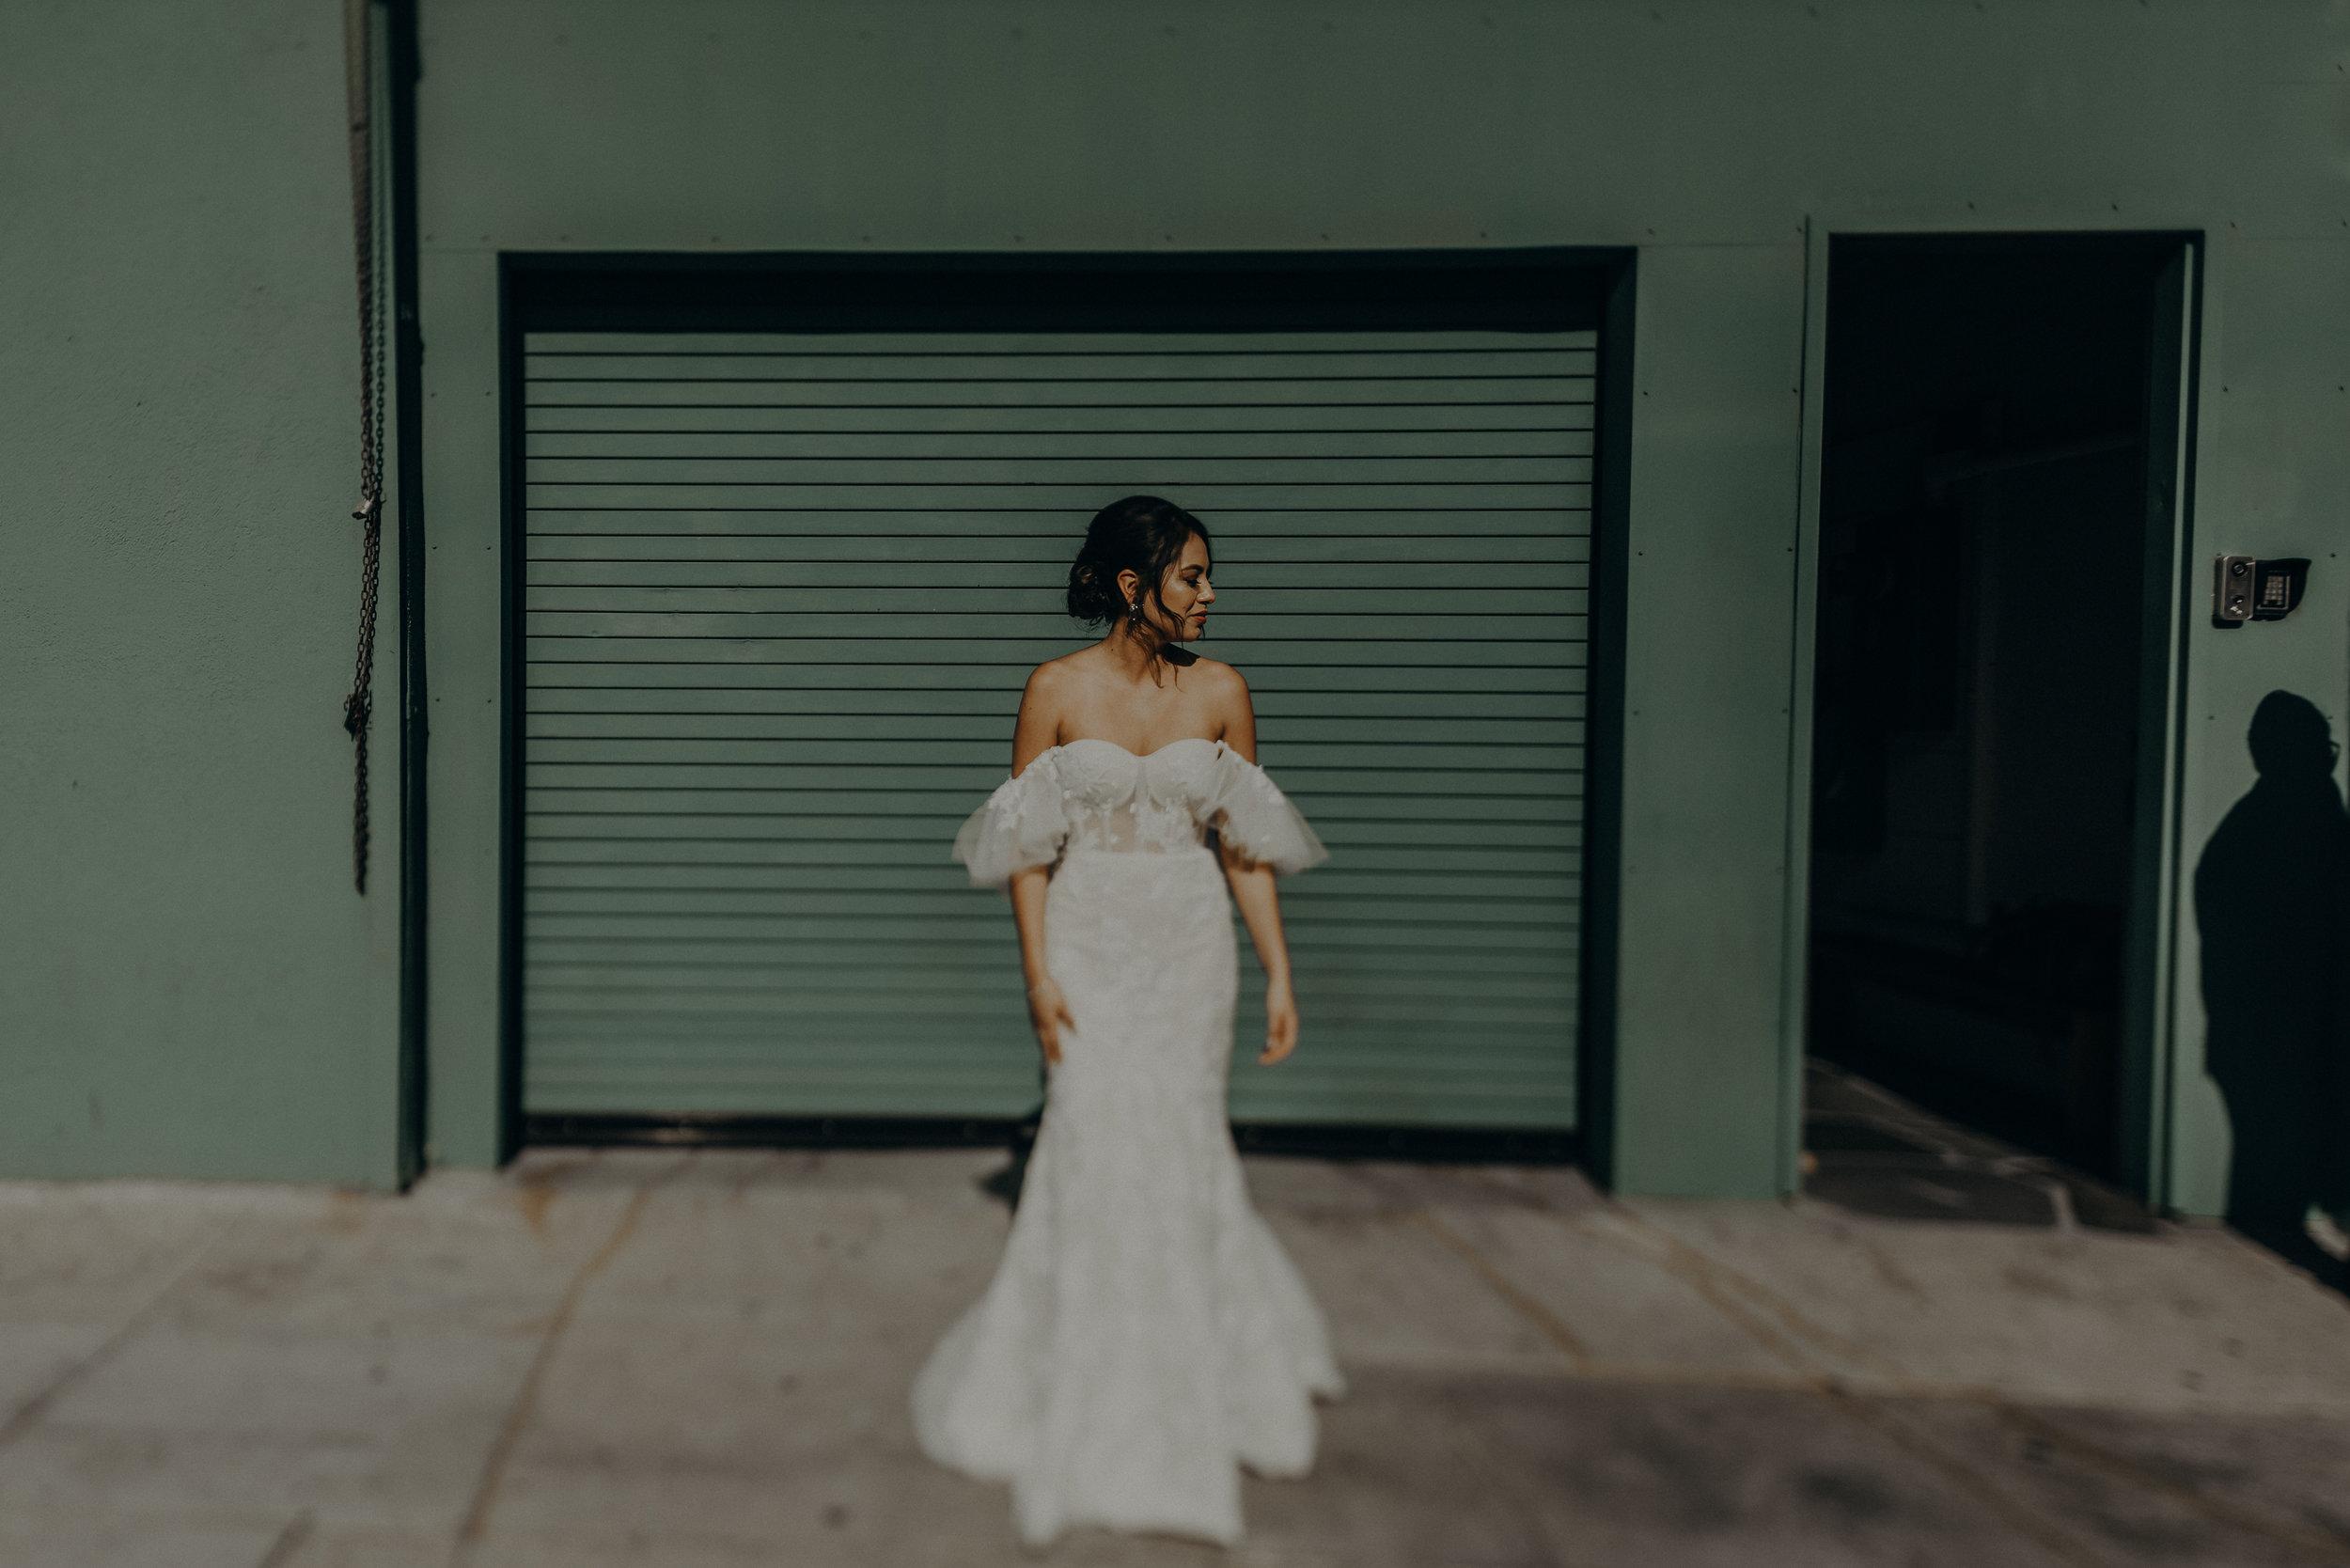 ©Isaiah + Taylor Photography - the Millwick Wedding, Long Beach Wedding Photographer-056.jpg